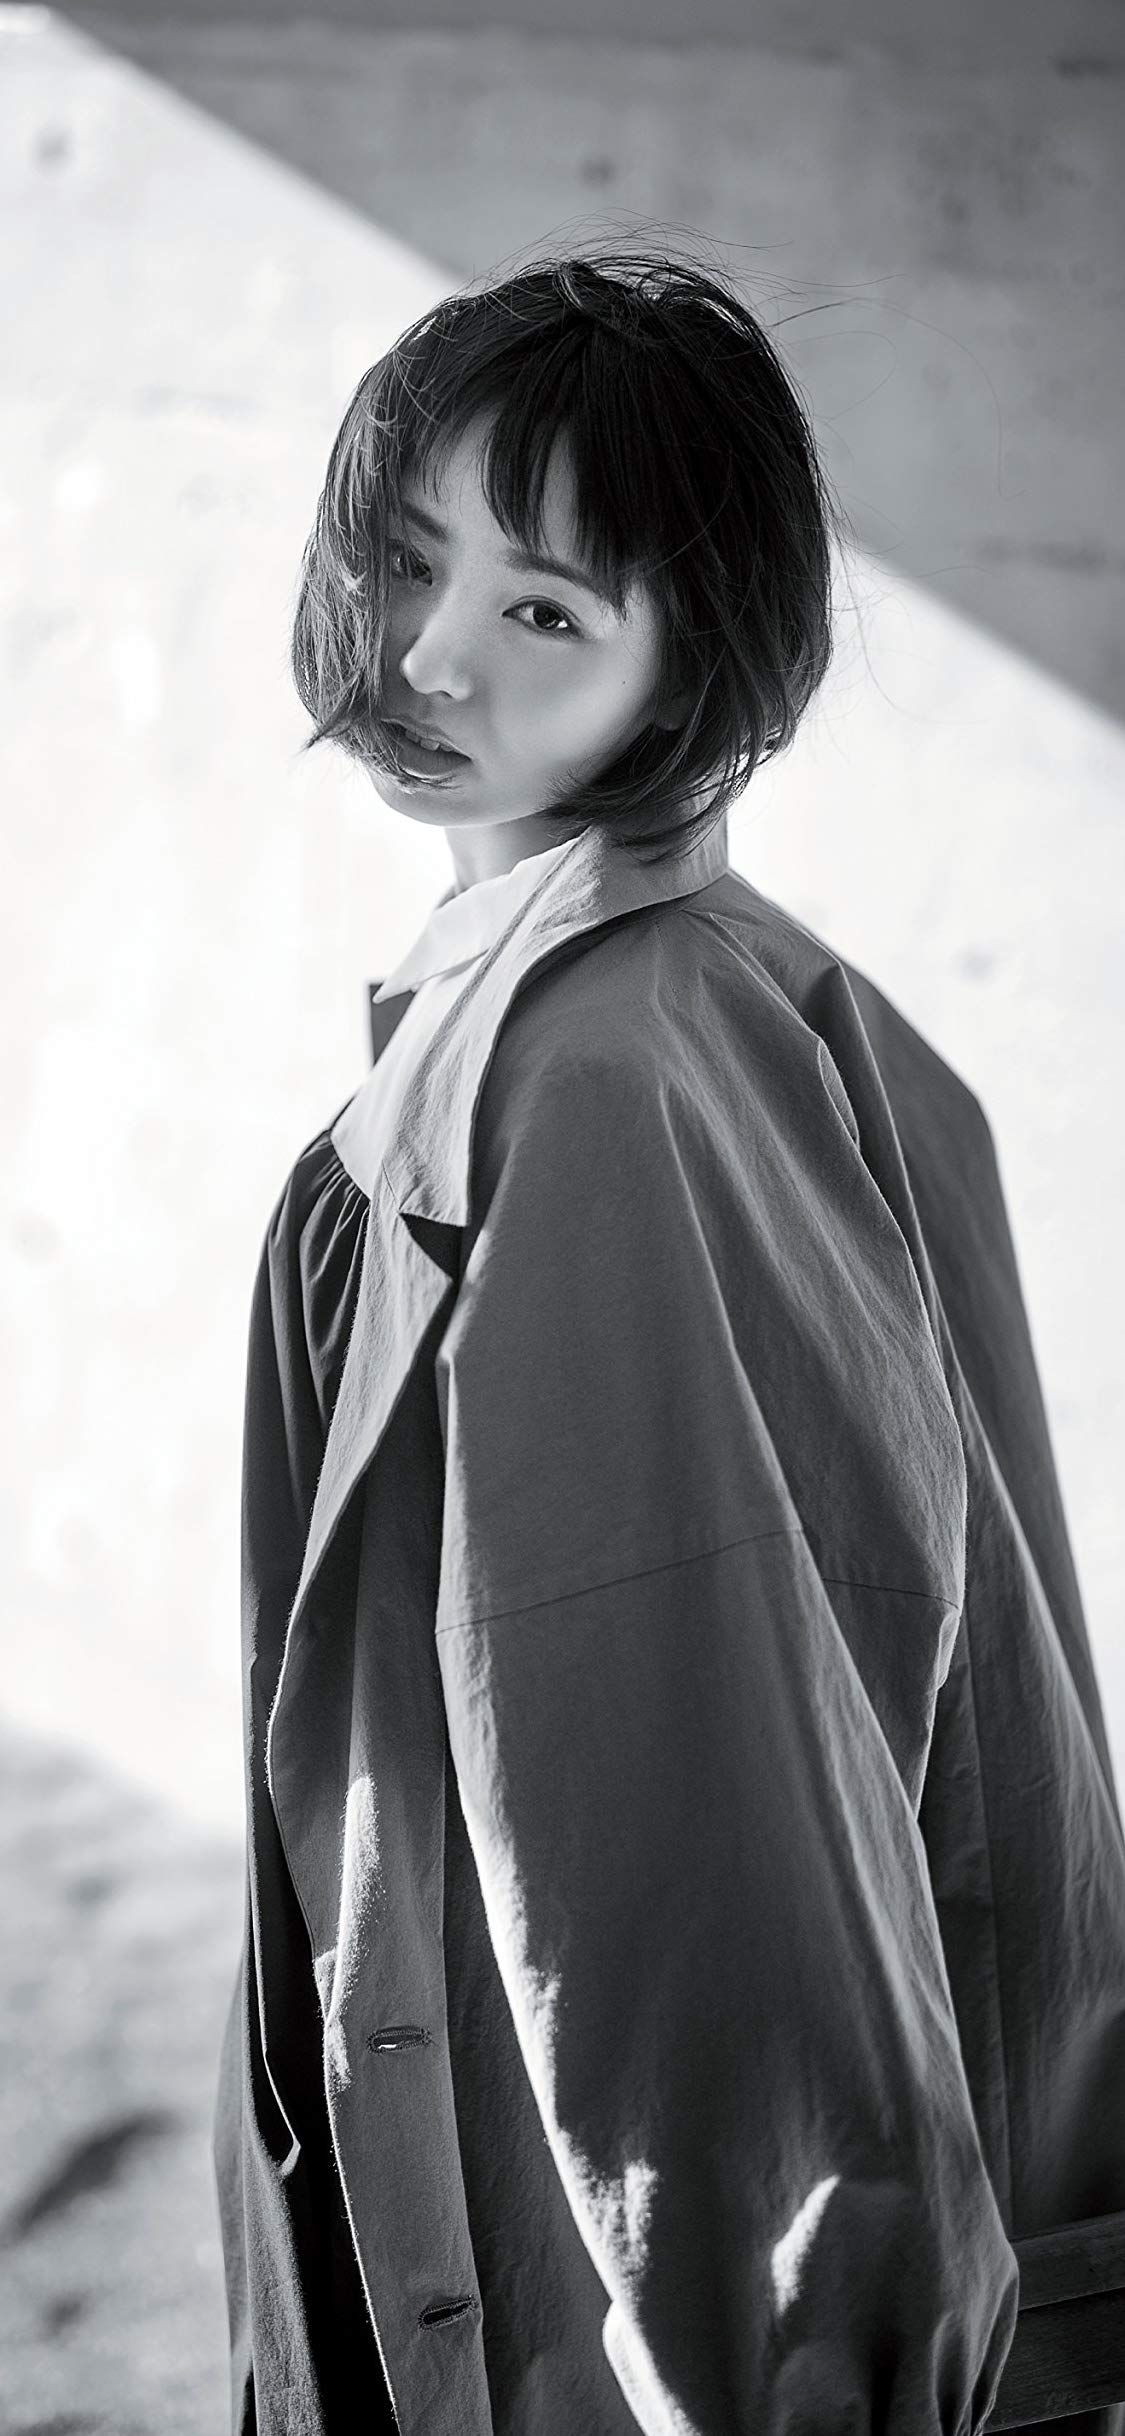 欅坂46 今泉佑唯 Iphone X 壁紙 1125x2436 画像 今泉佑唯 今泉 欅坂46